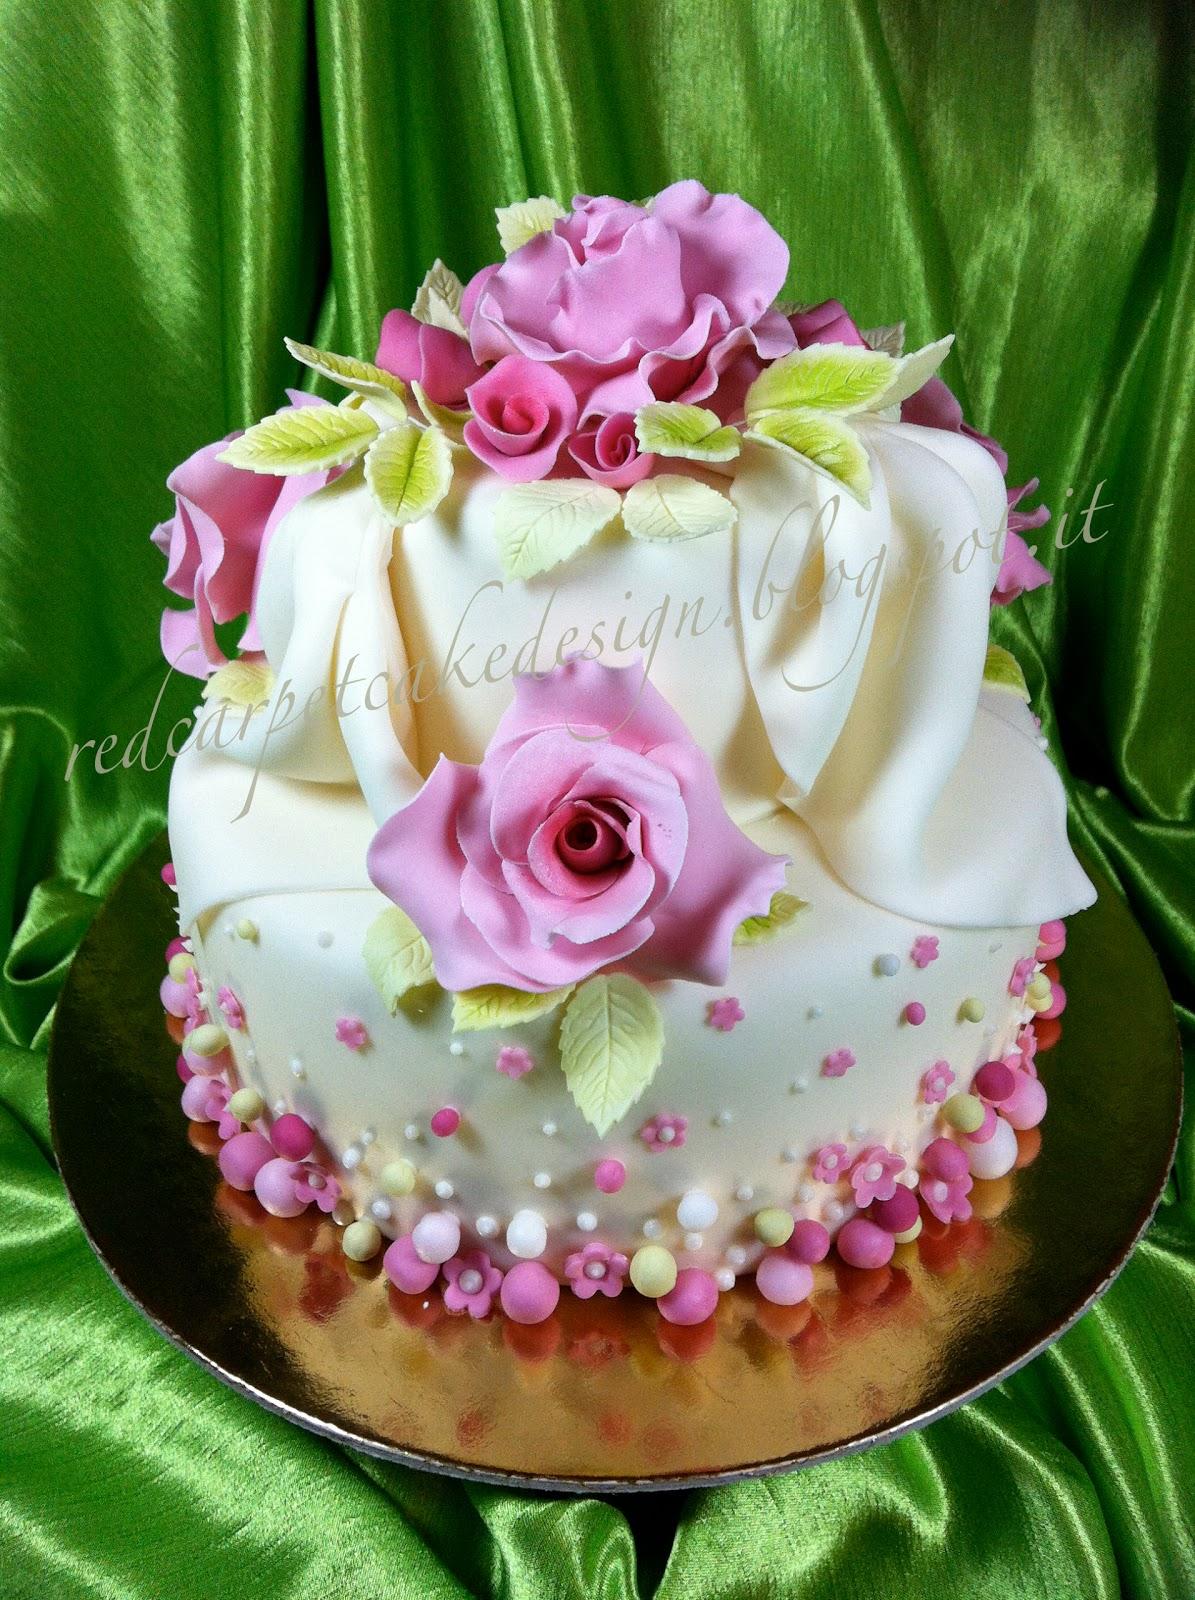 Red Rose Cake Design : ROSES AND POIS ELEGANT CAKE by Red Carpet Cake Design ...